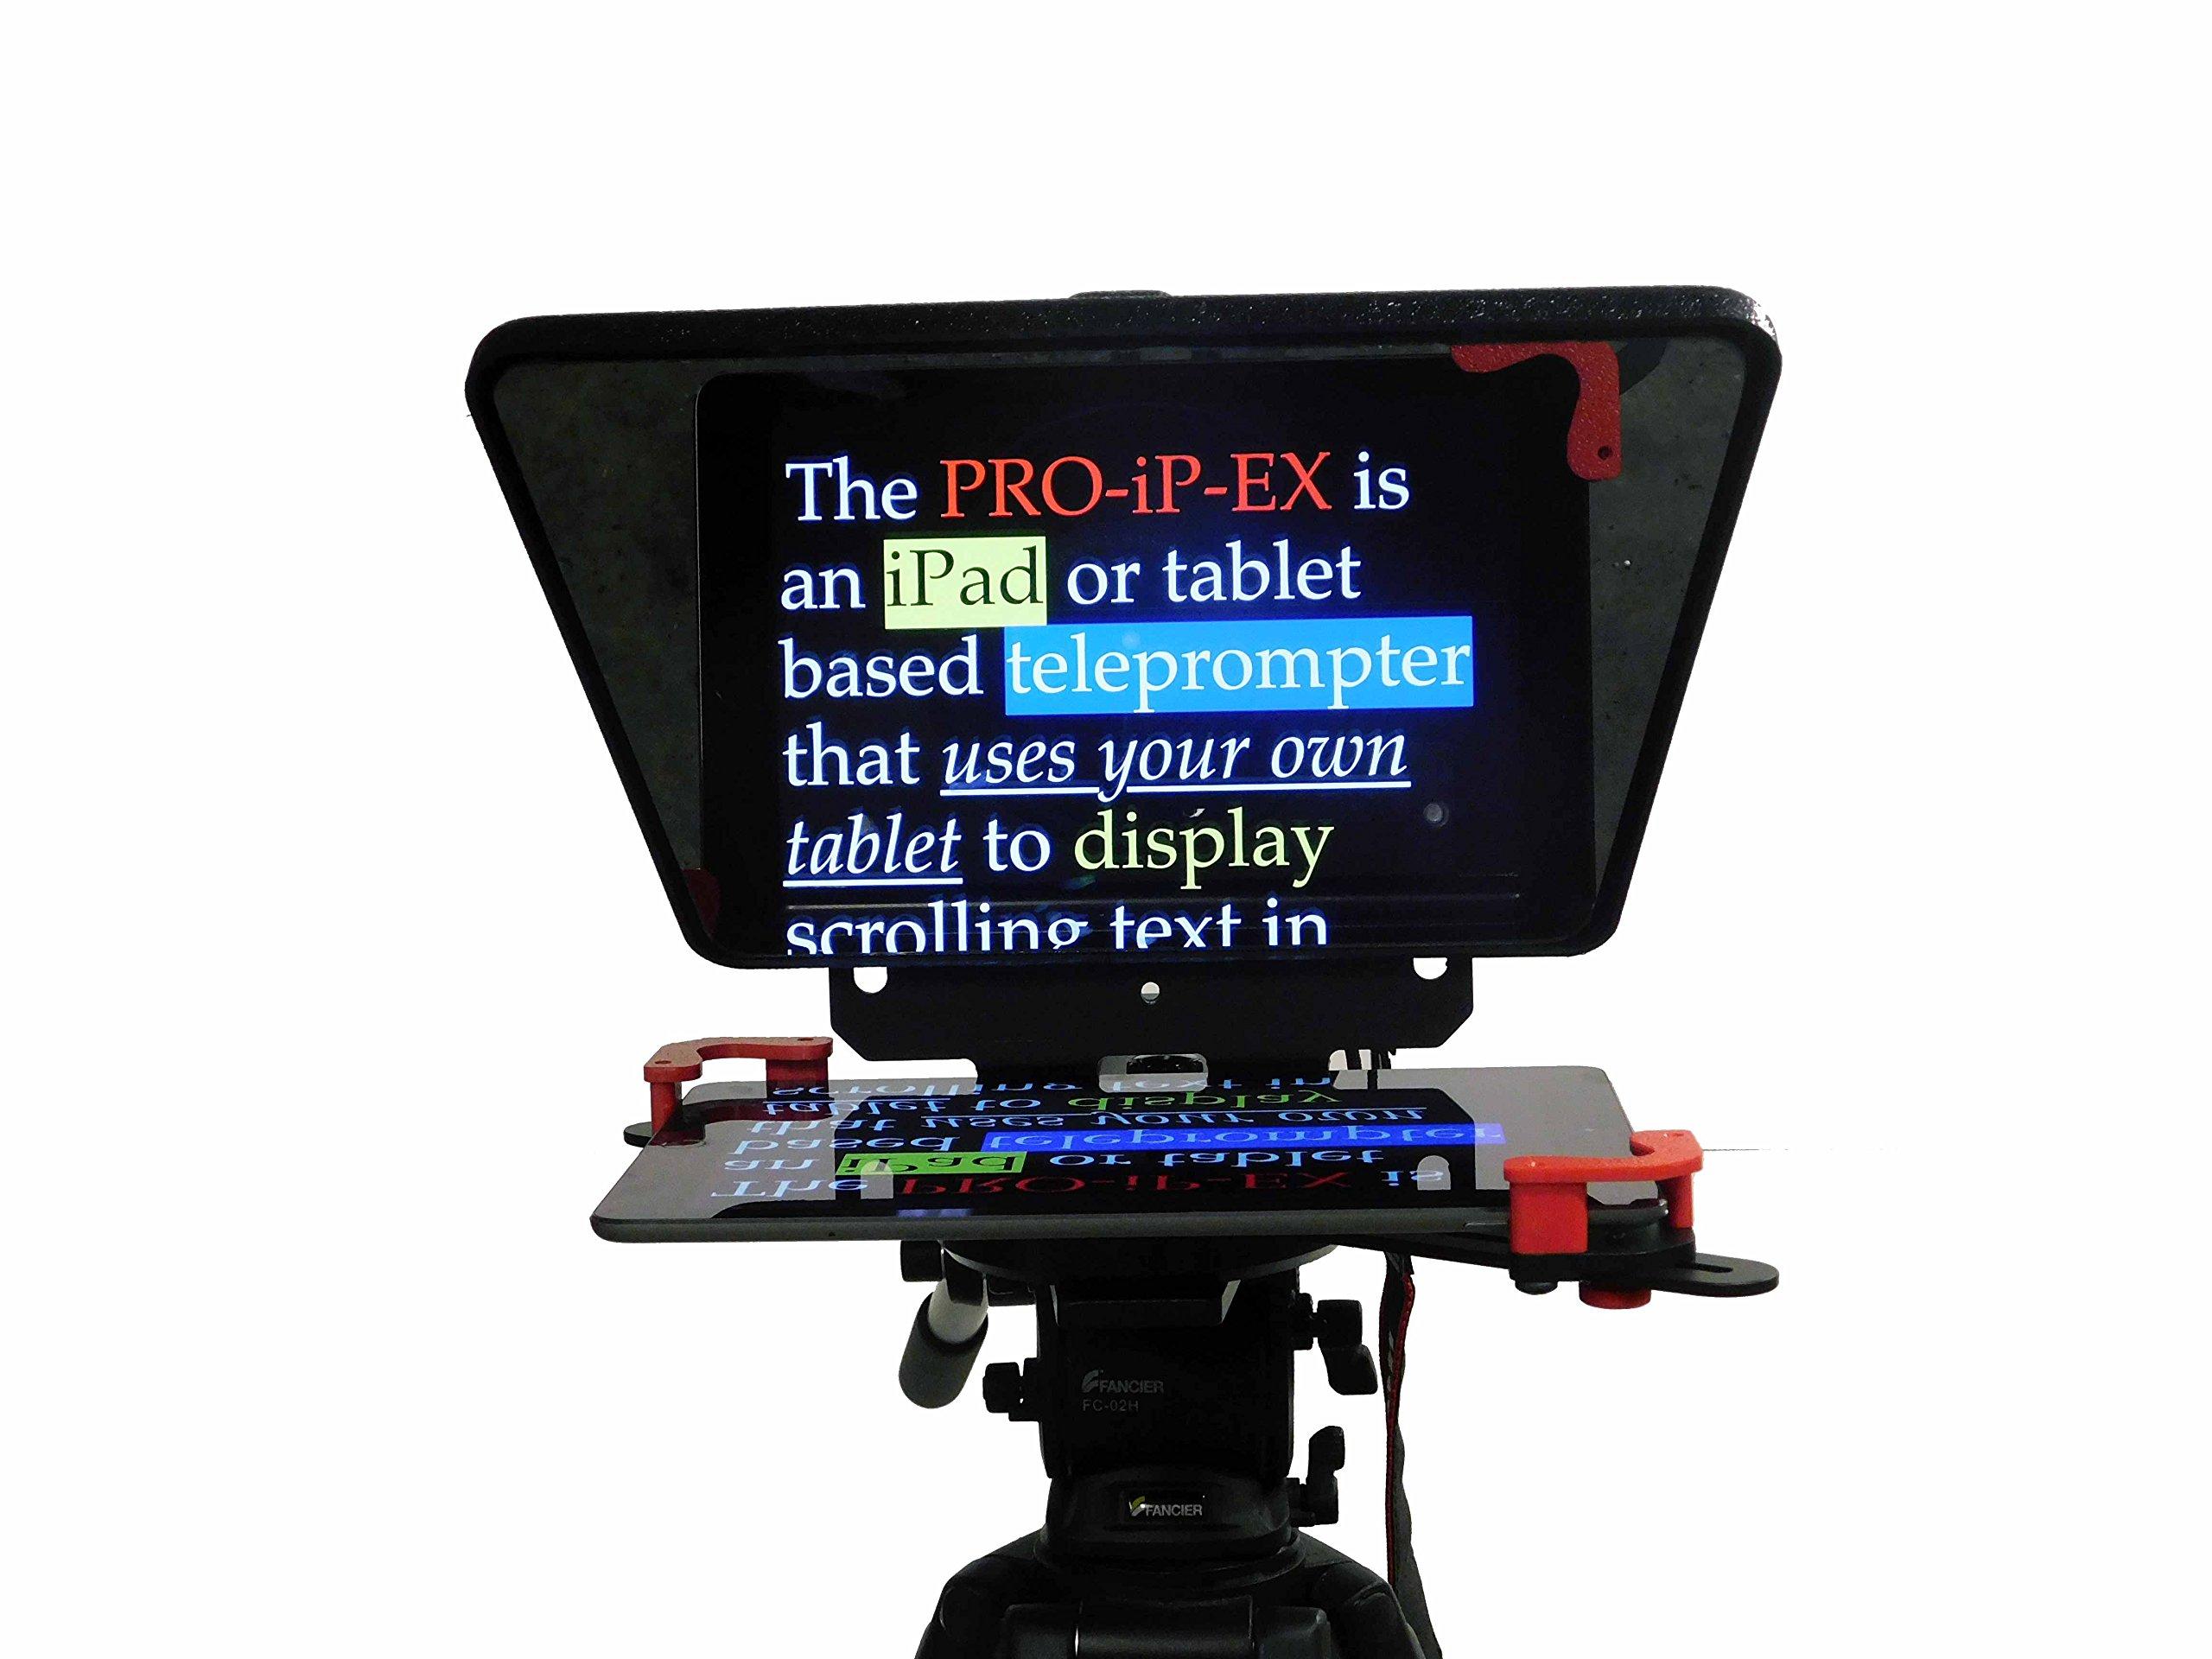 Telmax PROIPEX iPad / Android / Smartphone Universal Teleprompter by Telmax Teleprompters (Image #5)